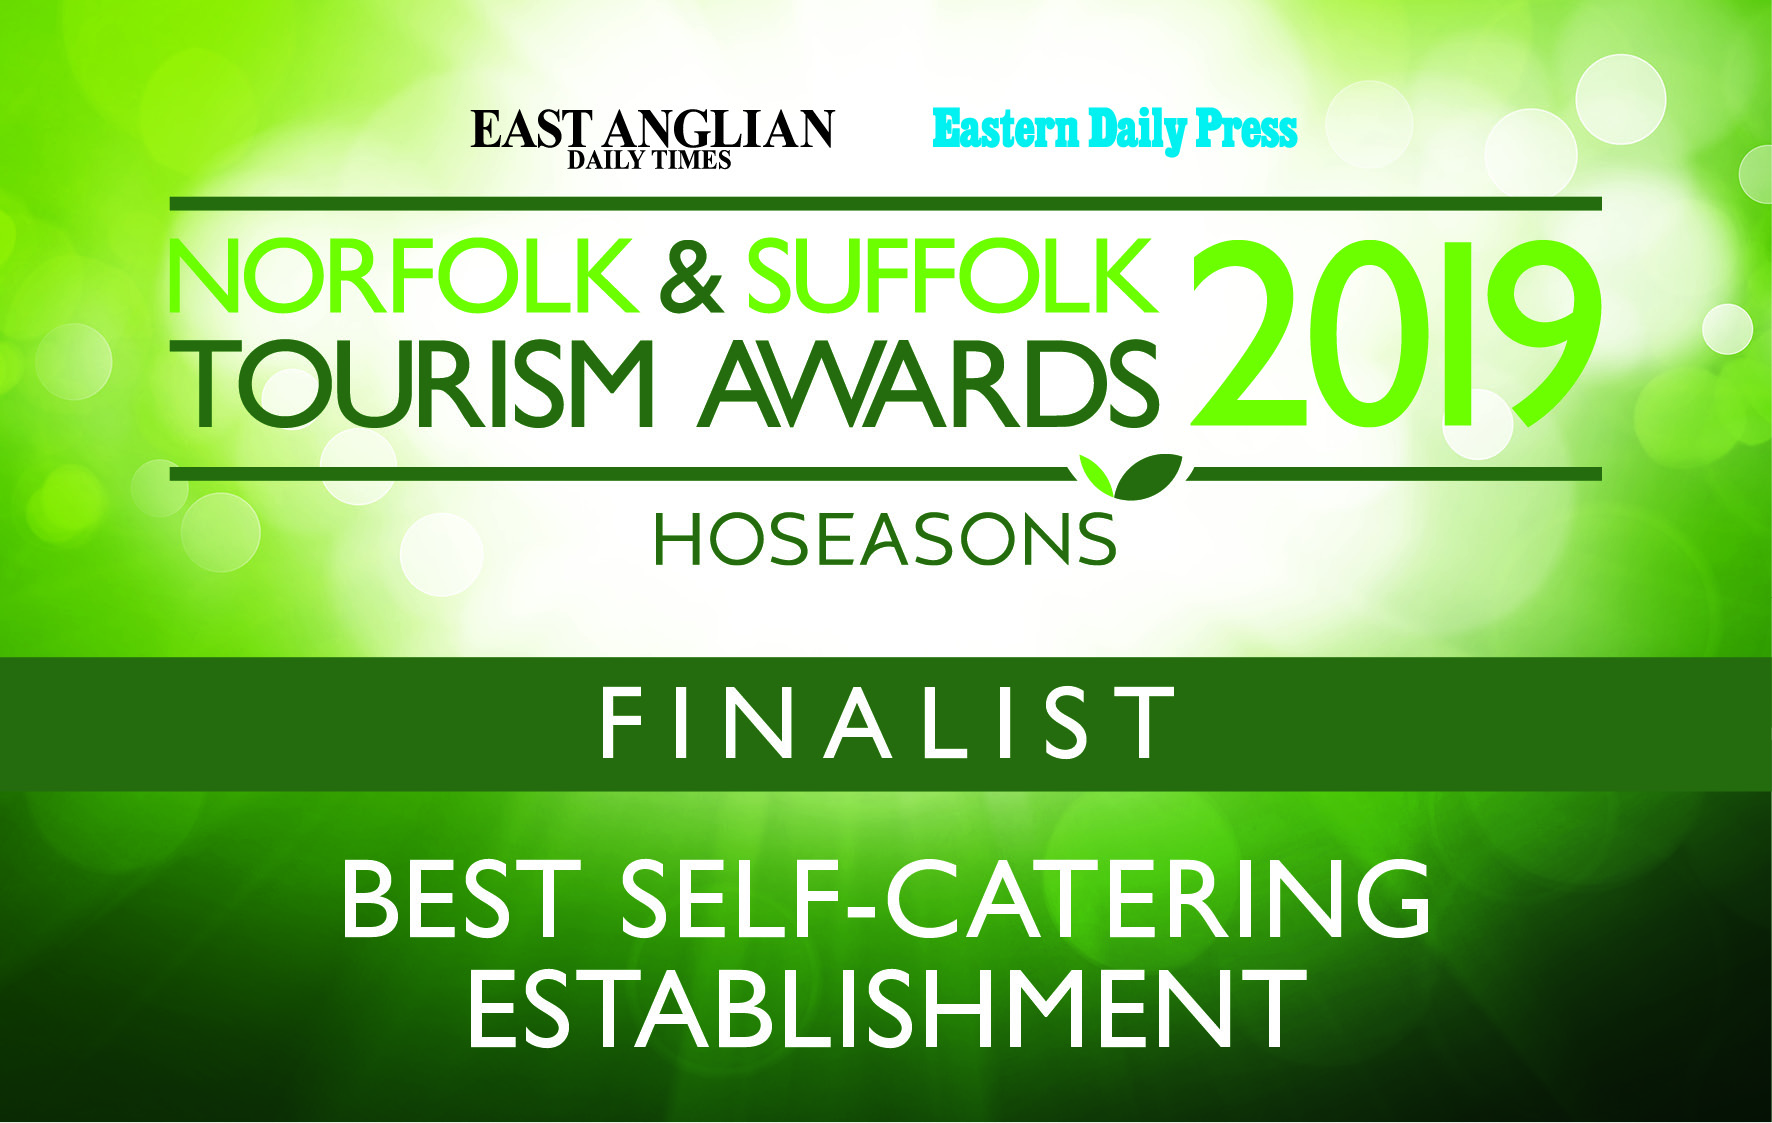 Finalist Best Self-Catering